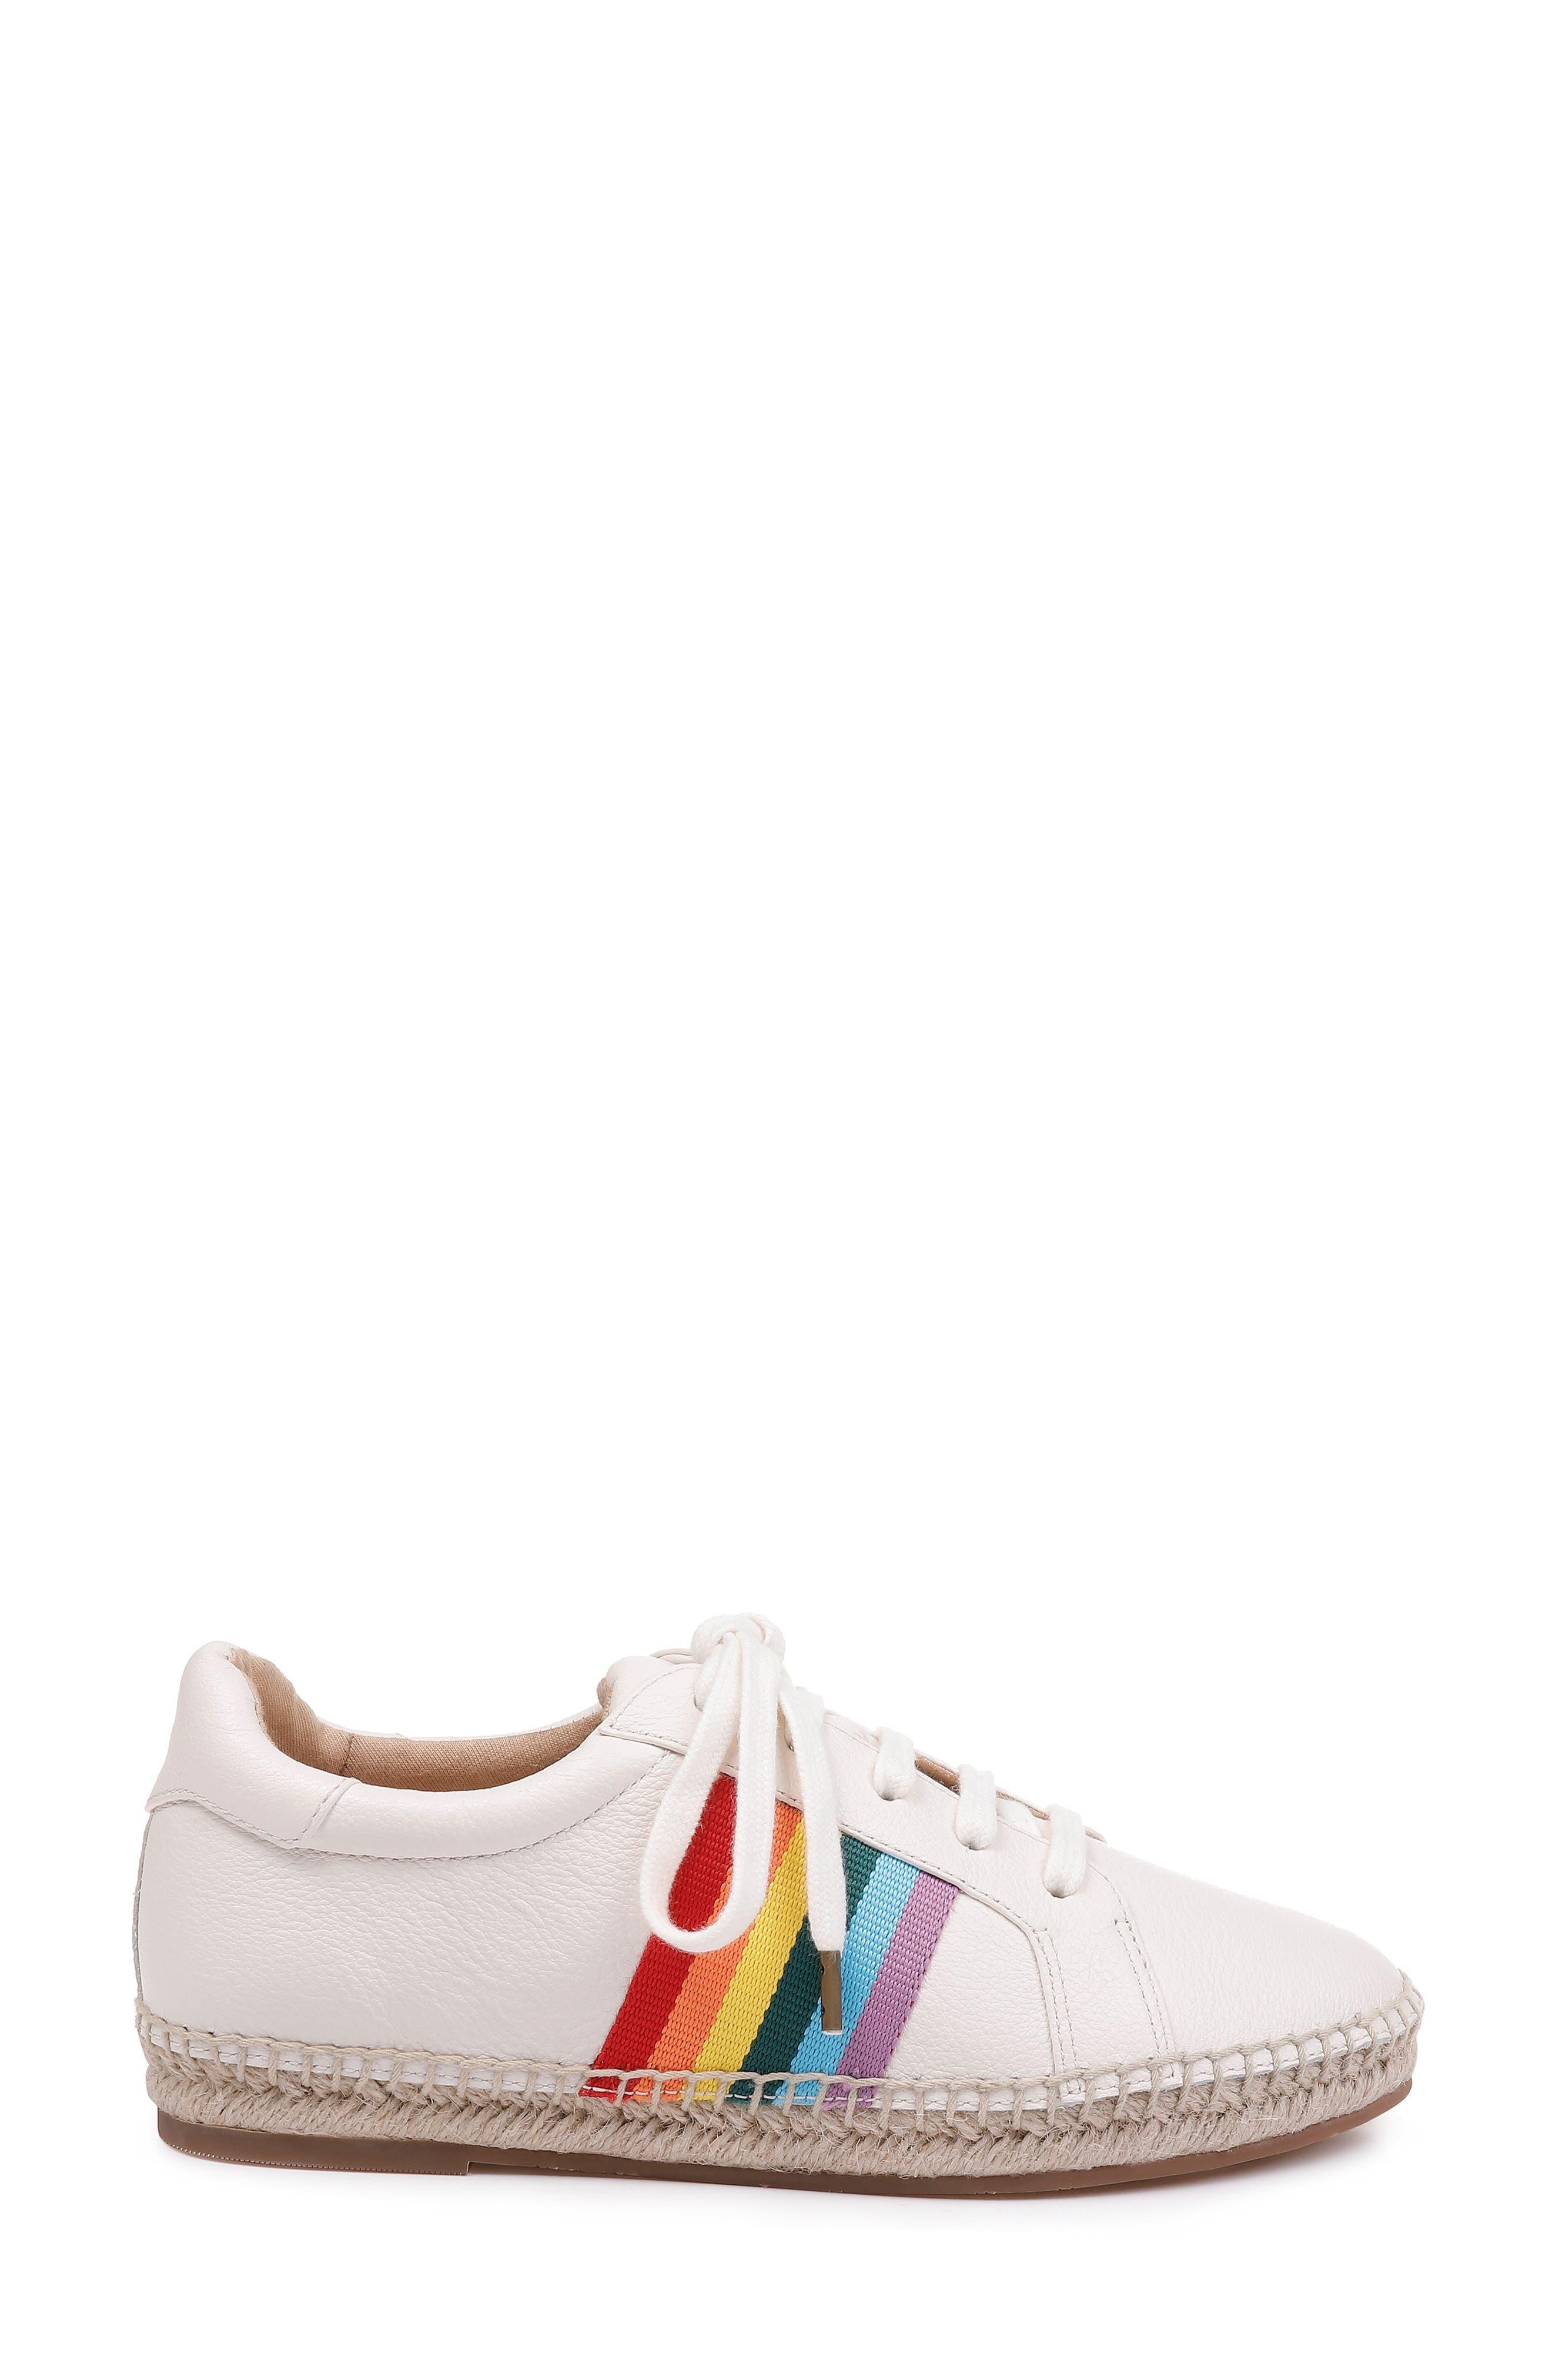 SPLENDID, Sada Espadrille Sneaker, Alternate thumbnail 3, color, OFF WHITE LEATHER